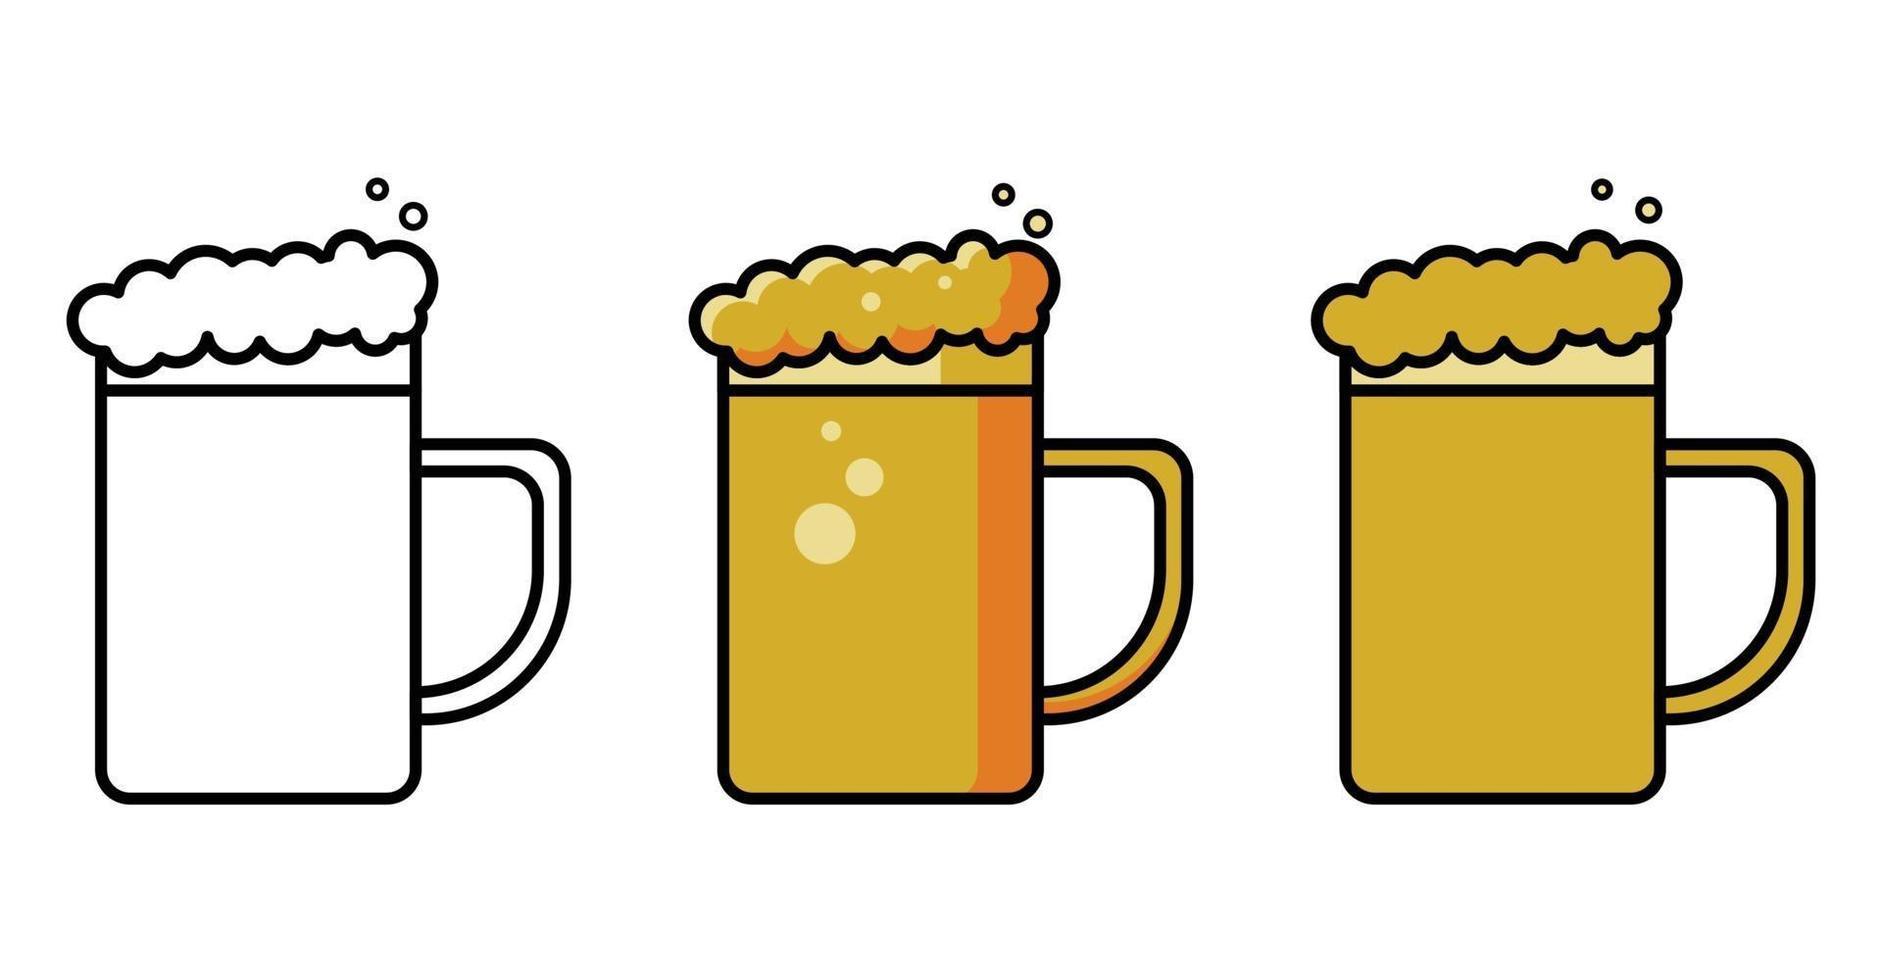 öl mugg vektor ikoner set